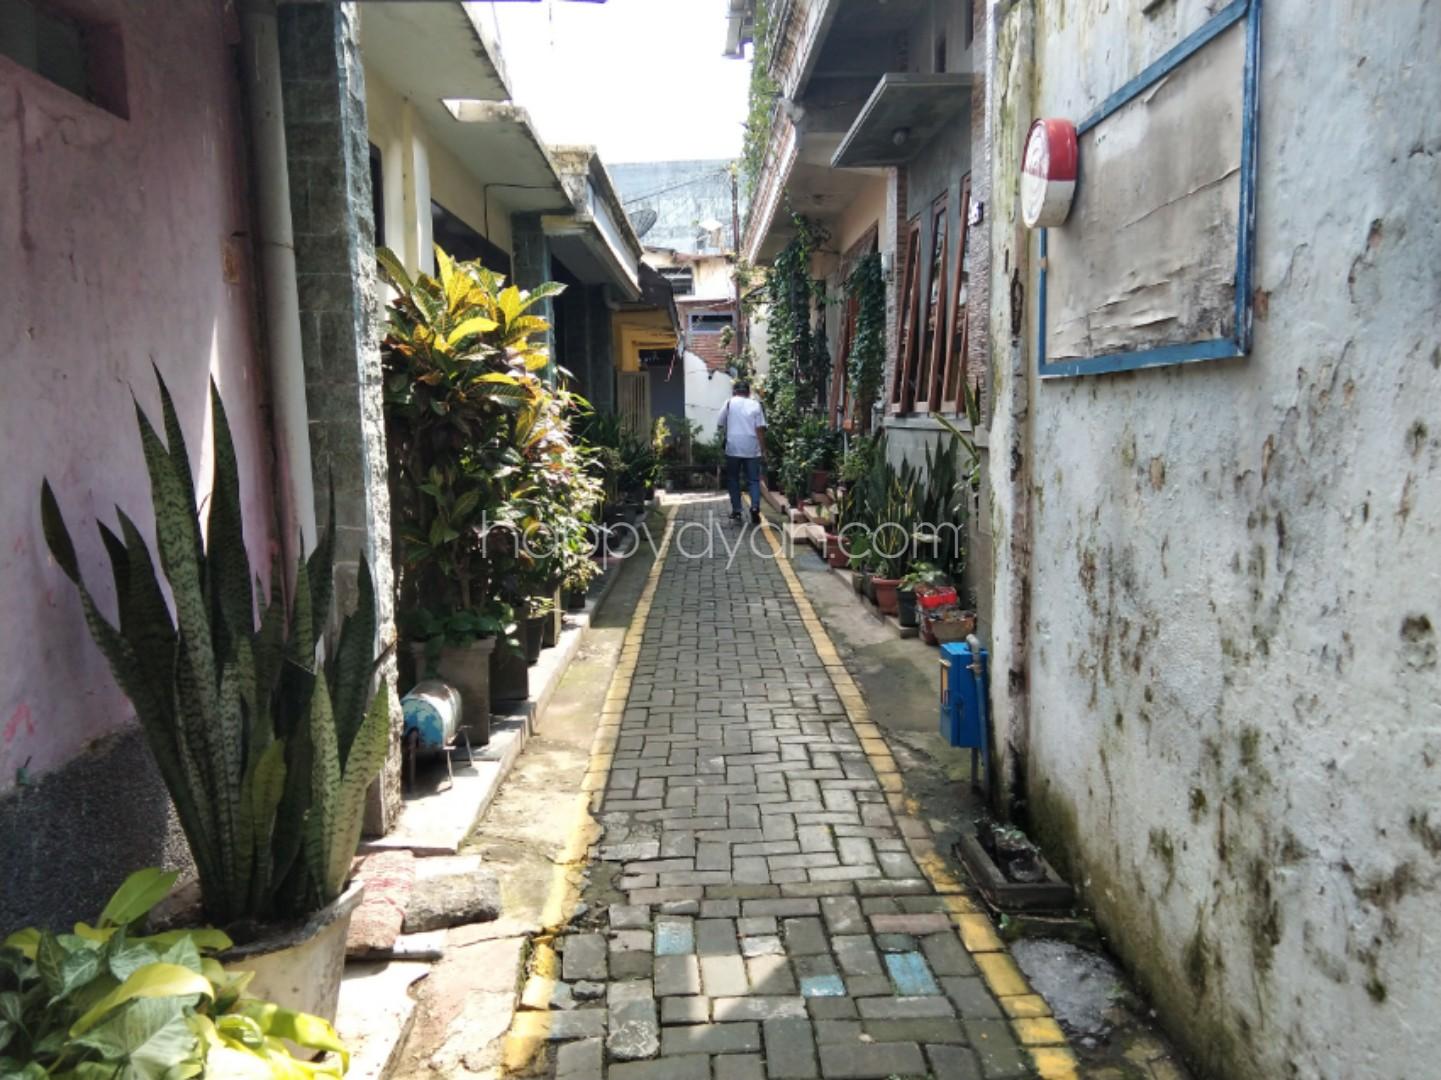 Lingkungan Kampoeng Heritage Kajoetangan Kayutangan